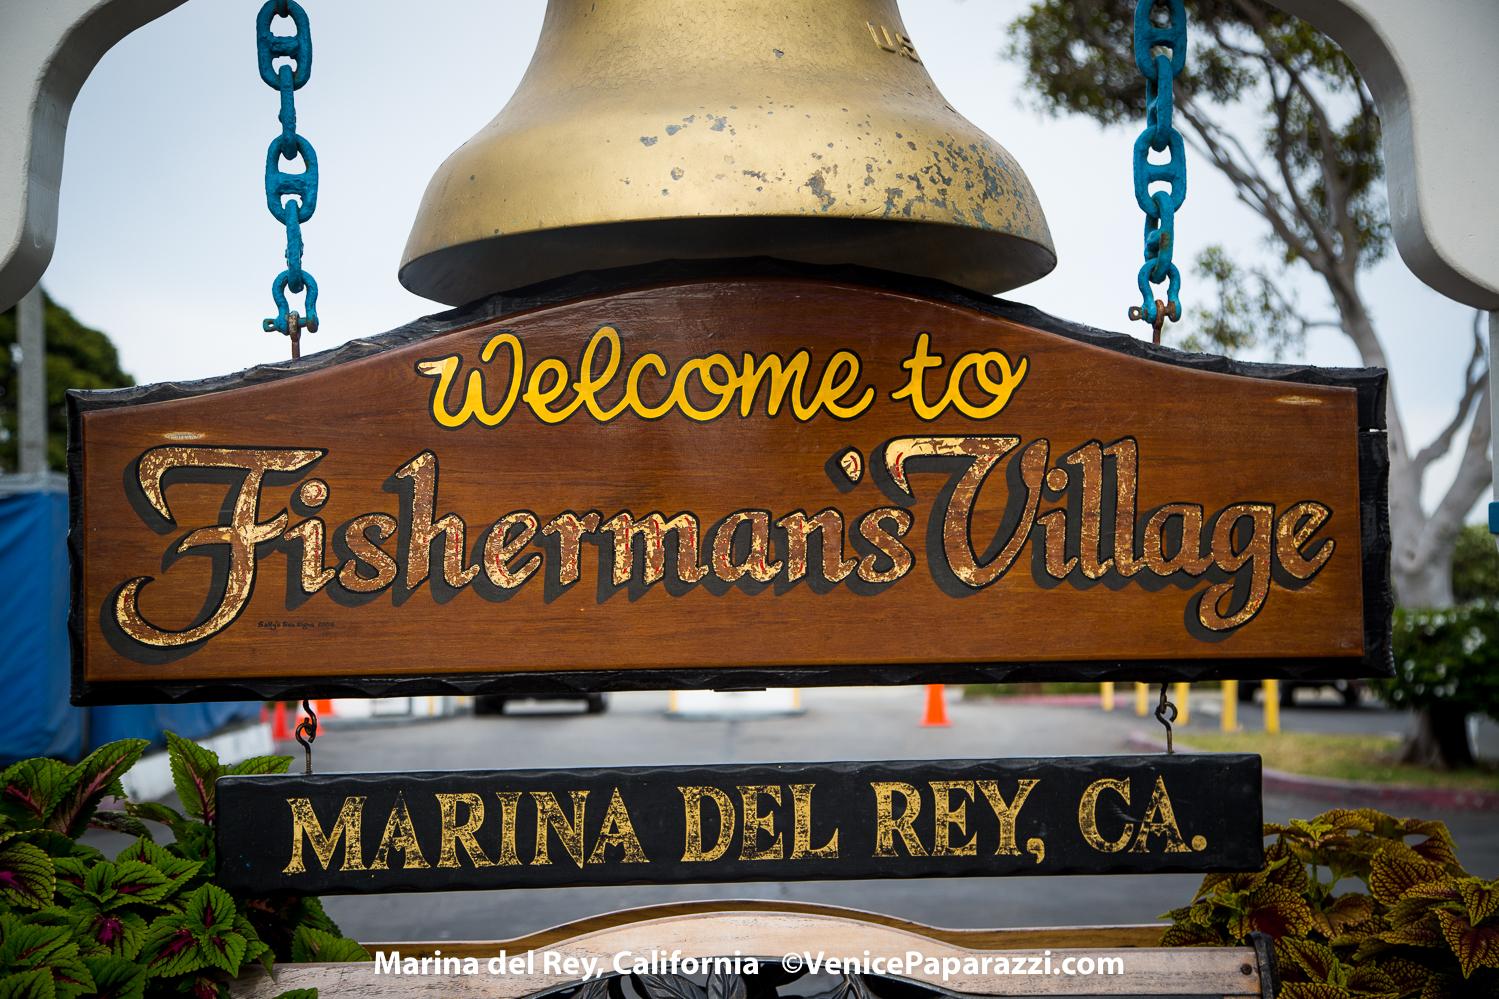 The marina marina del rey for Deep sea fishing marina del rey